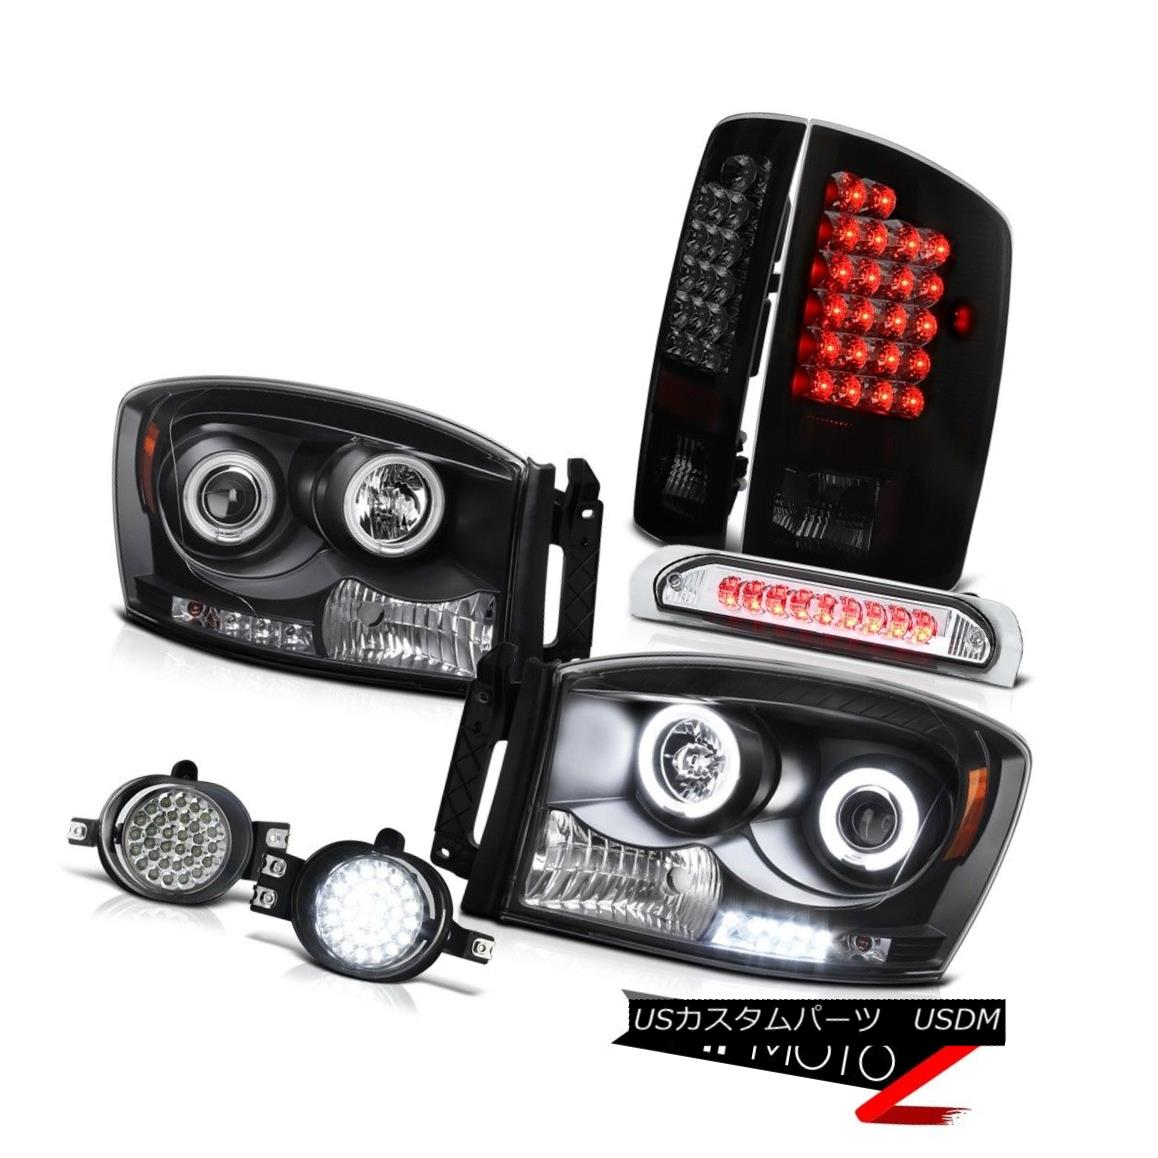 For Smoked 01-11 Ford Ranger Dual Halo LED Pro Headlights Smoke Head Lights